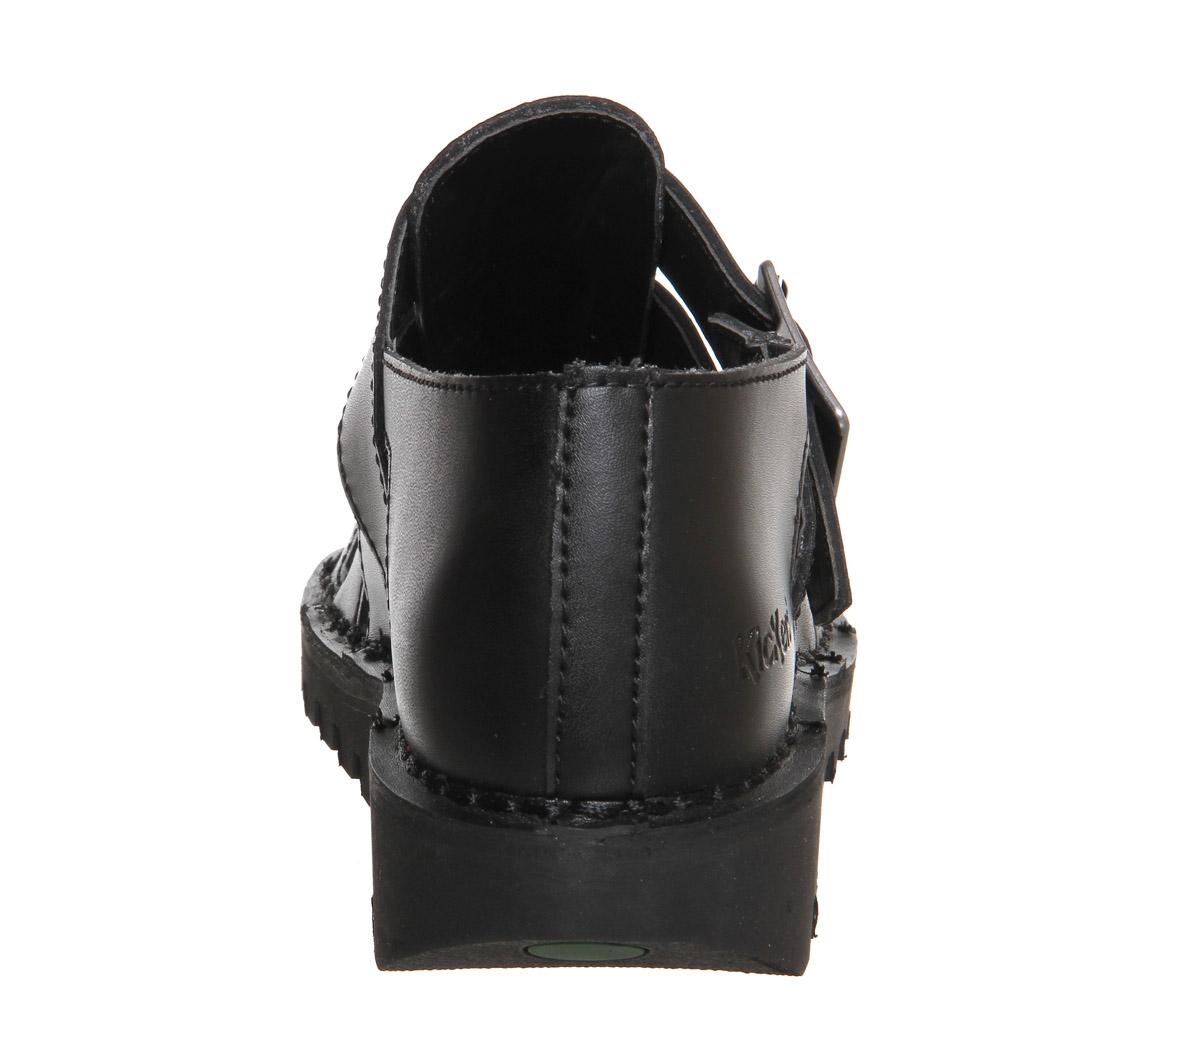 d4db15f6b75 Womens Kickers Kick Low Weave Black Leather Flats UK 7 for sale ...